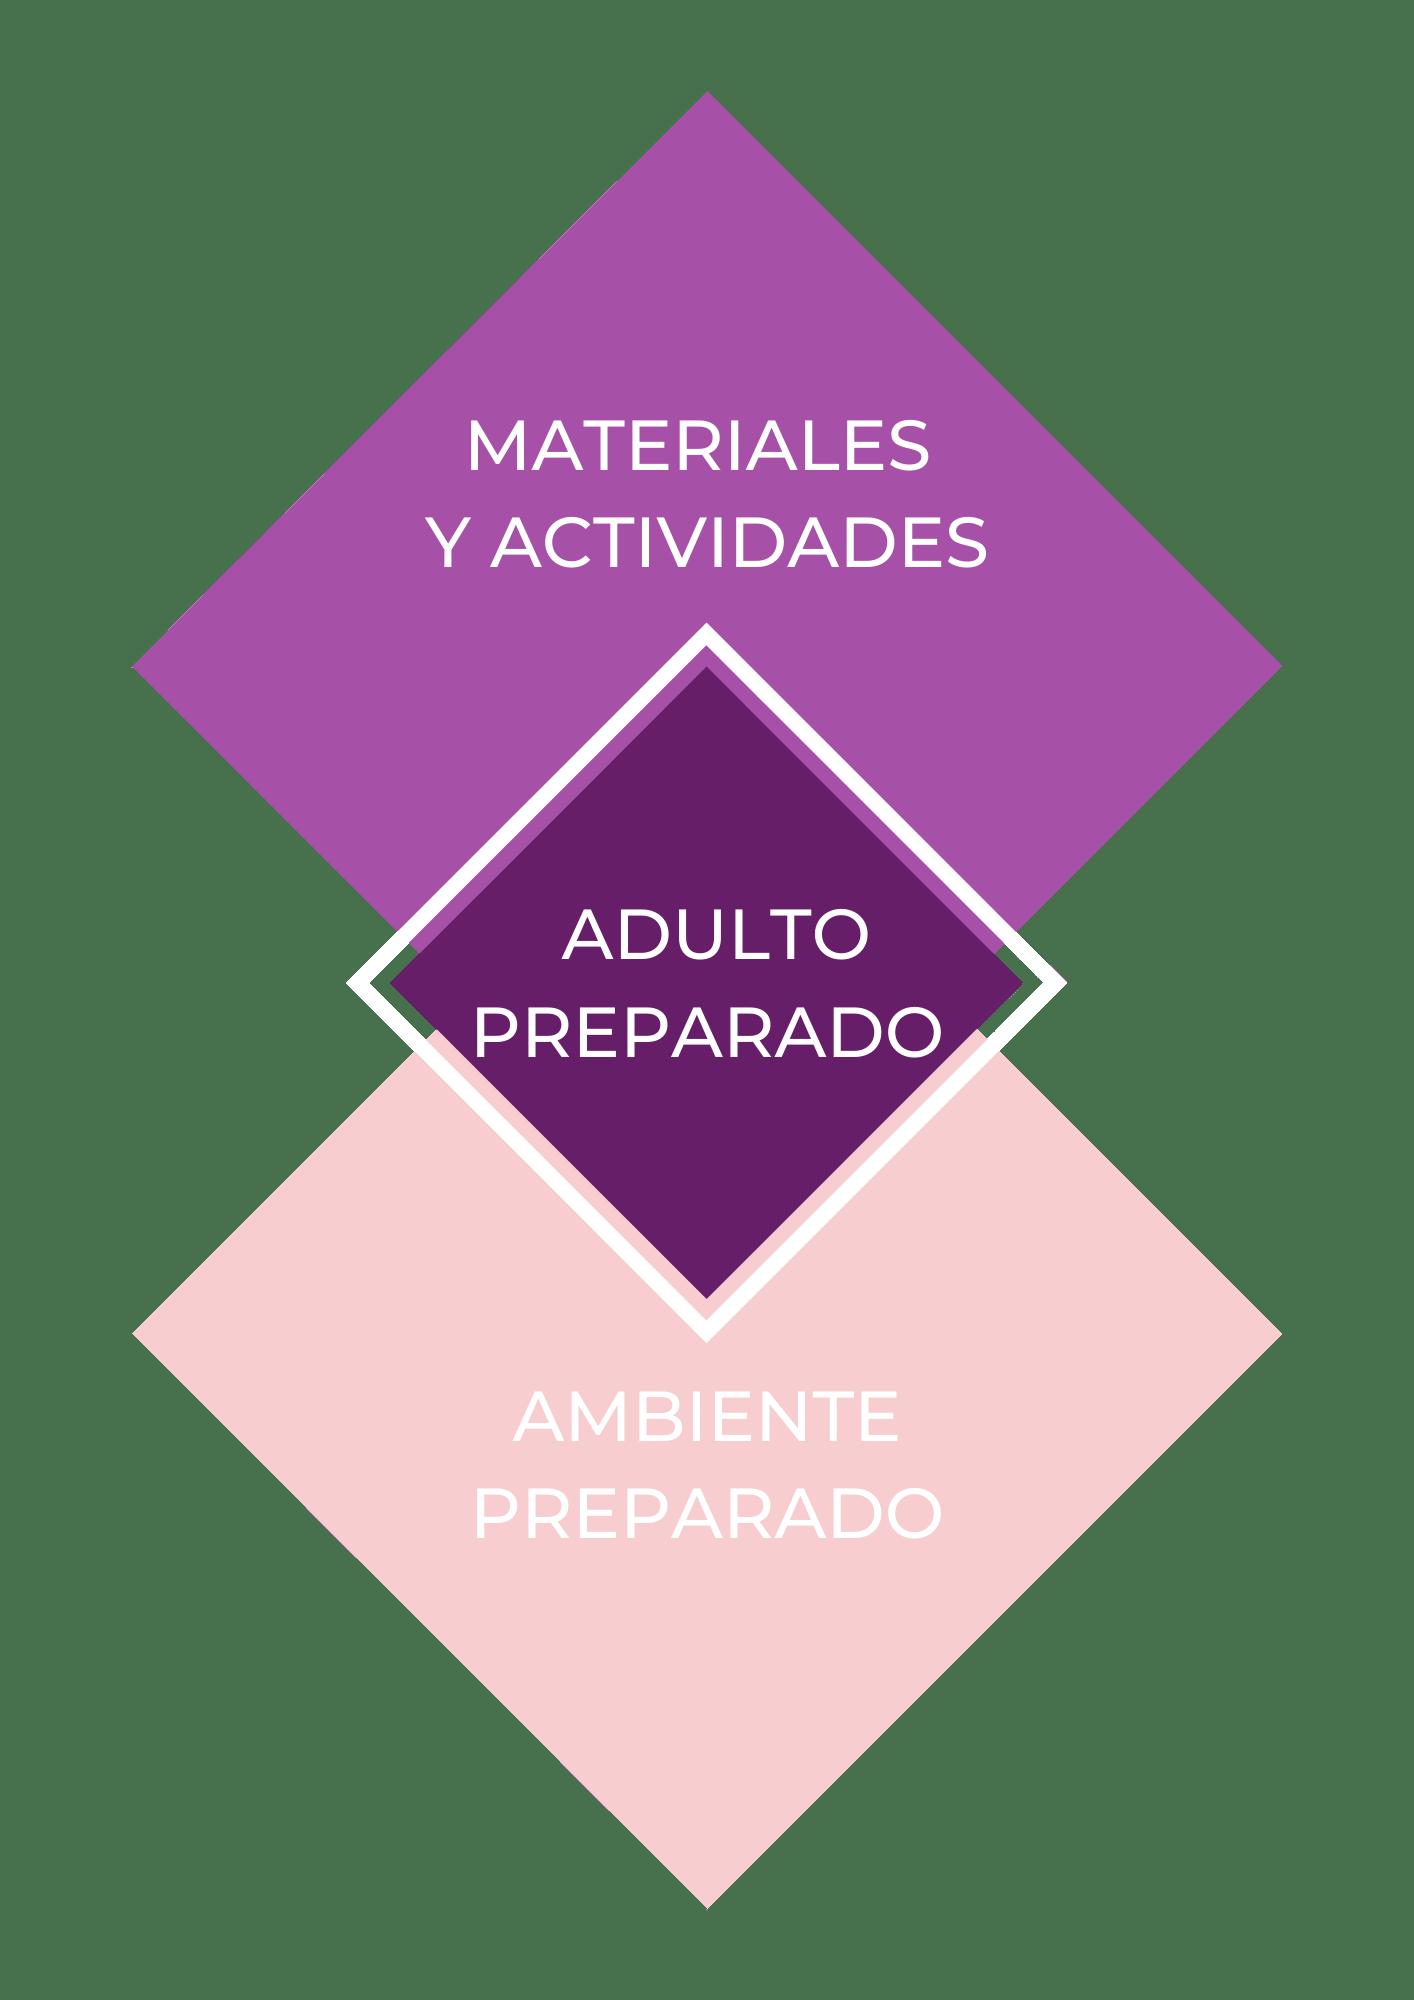 adulto_preparado